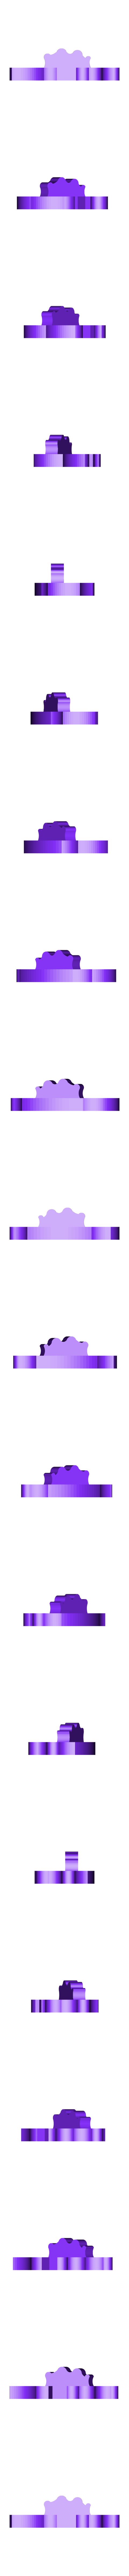 UpLeg2.stl Download free STL file Dinosaur Skel for 3D Printer! - Terry the Dinosaur! • 3D printer model, _aalejandrovr24